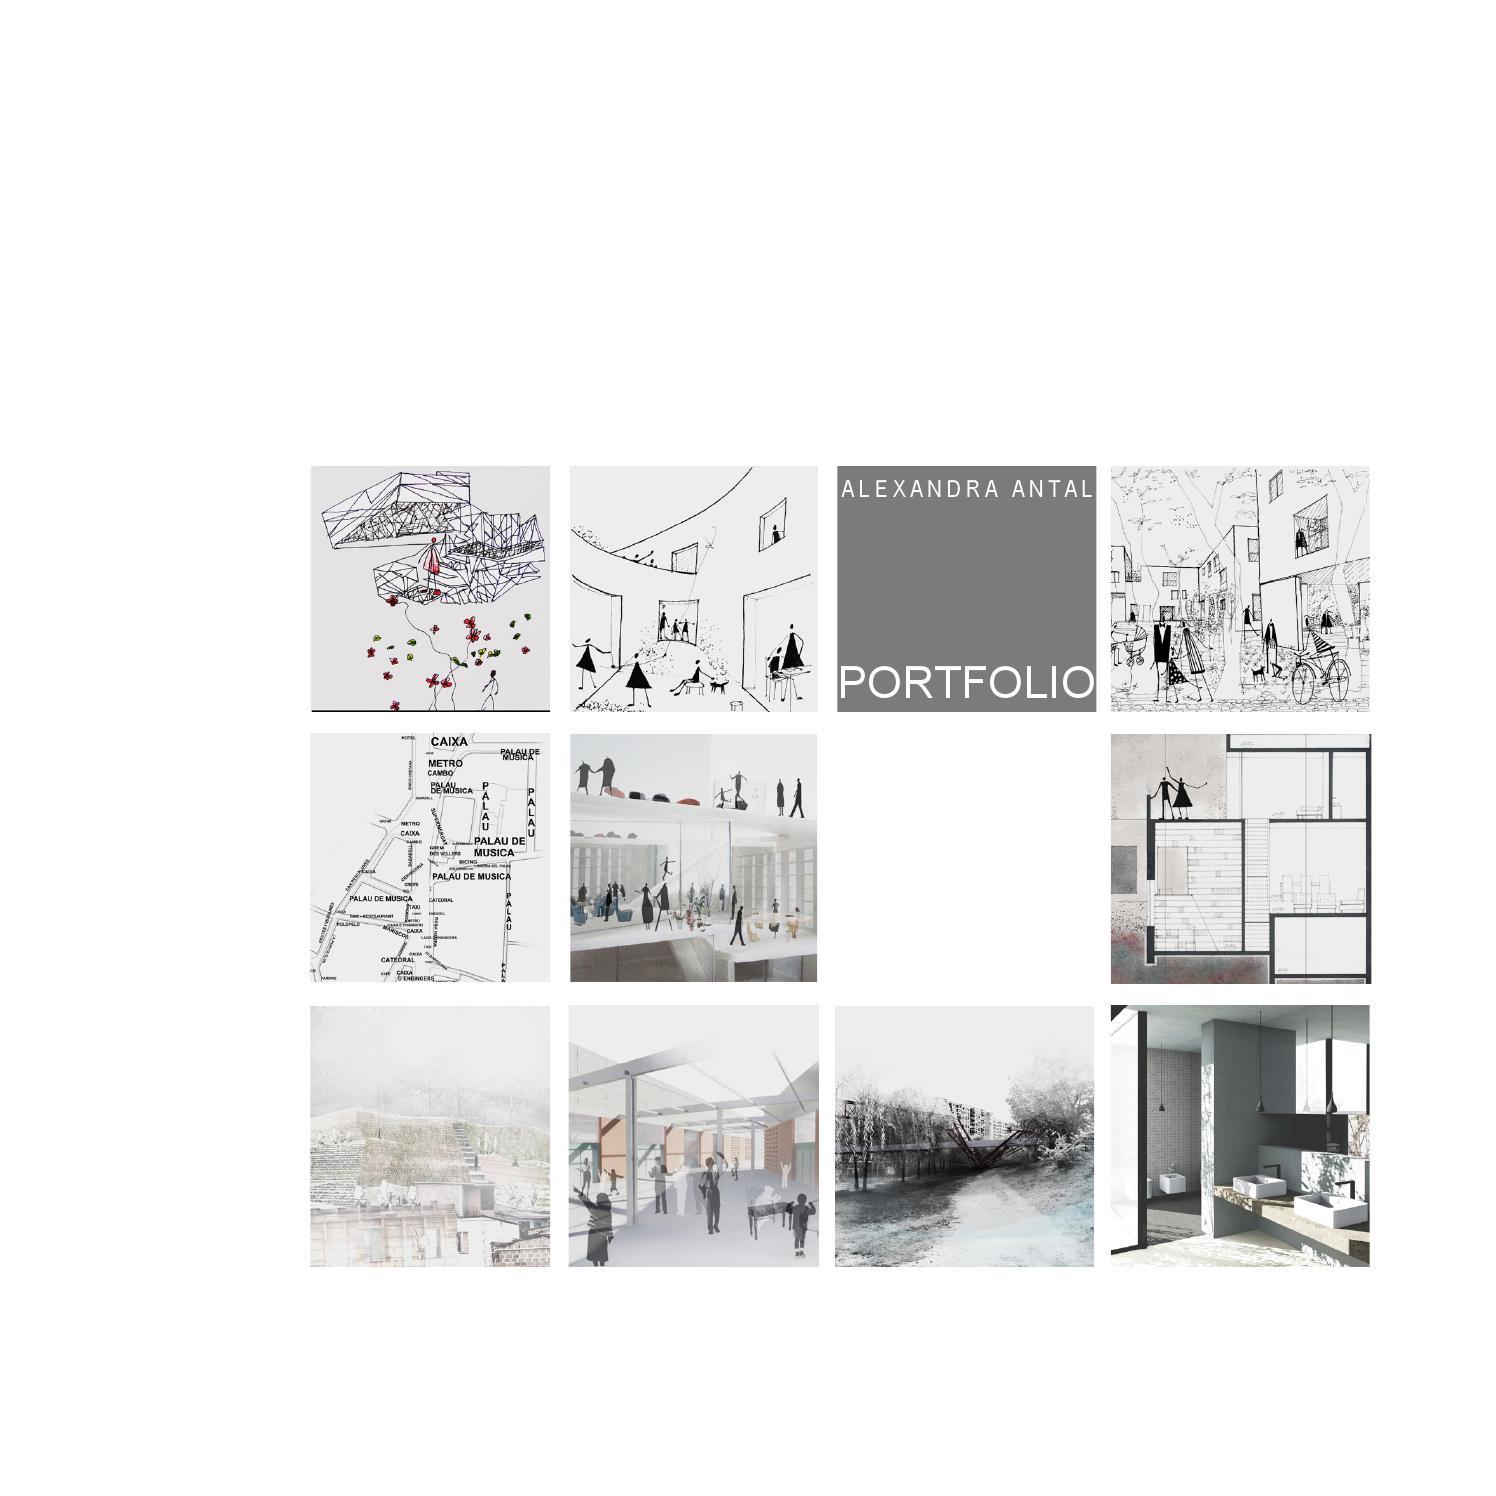 Interior Design Architecture Photography Portfolio: Alexandra Antal PORTFOLIO (Architecture) By Maria